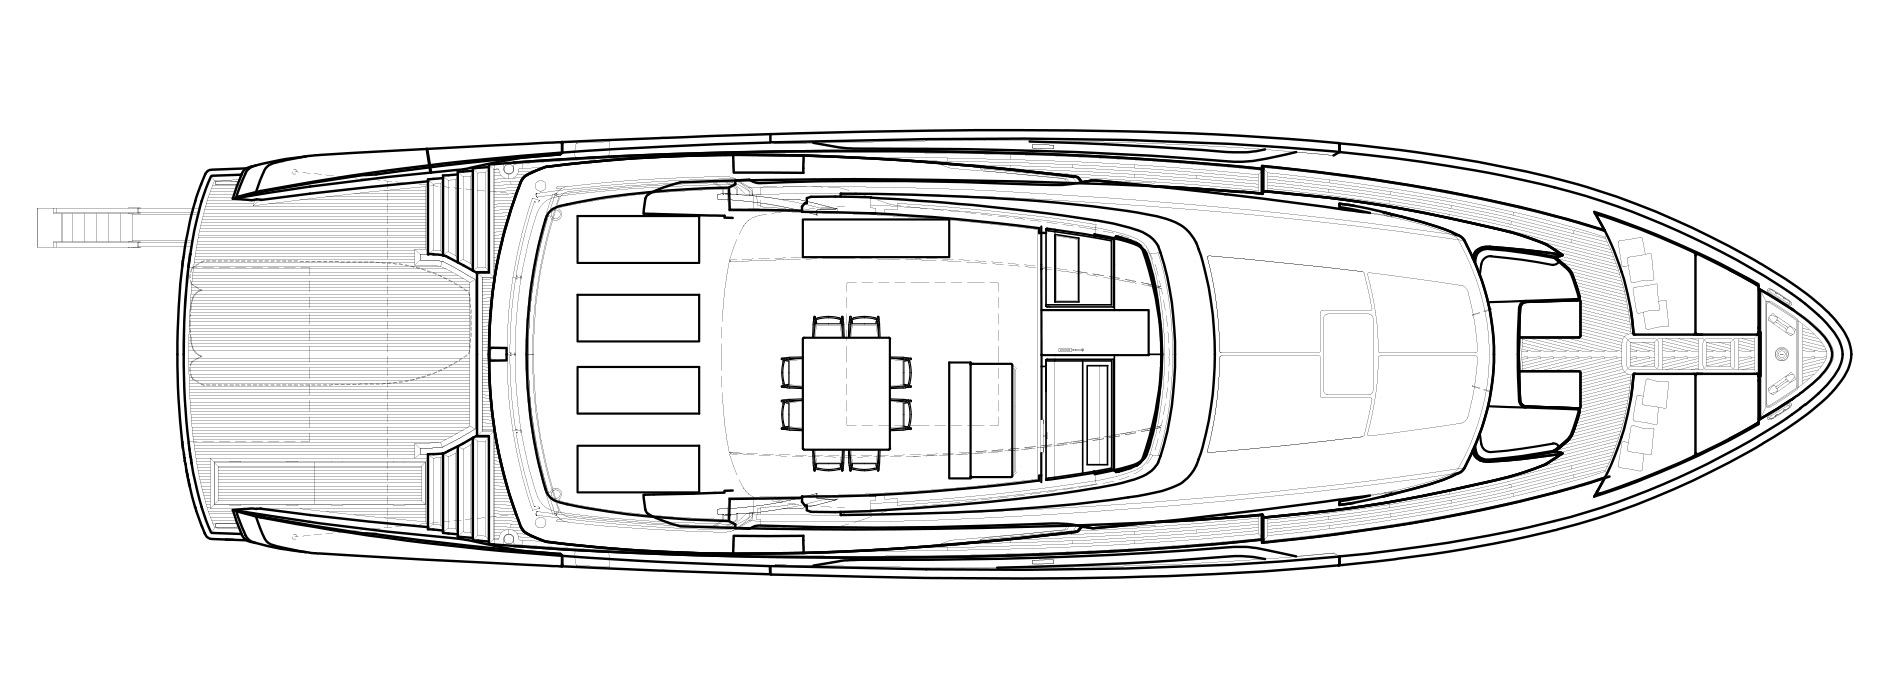 Sanlorenzo Yachts SX88 Флайбридж версия C